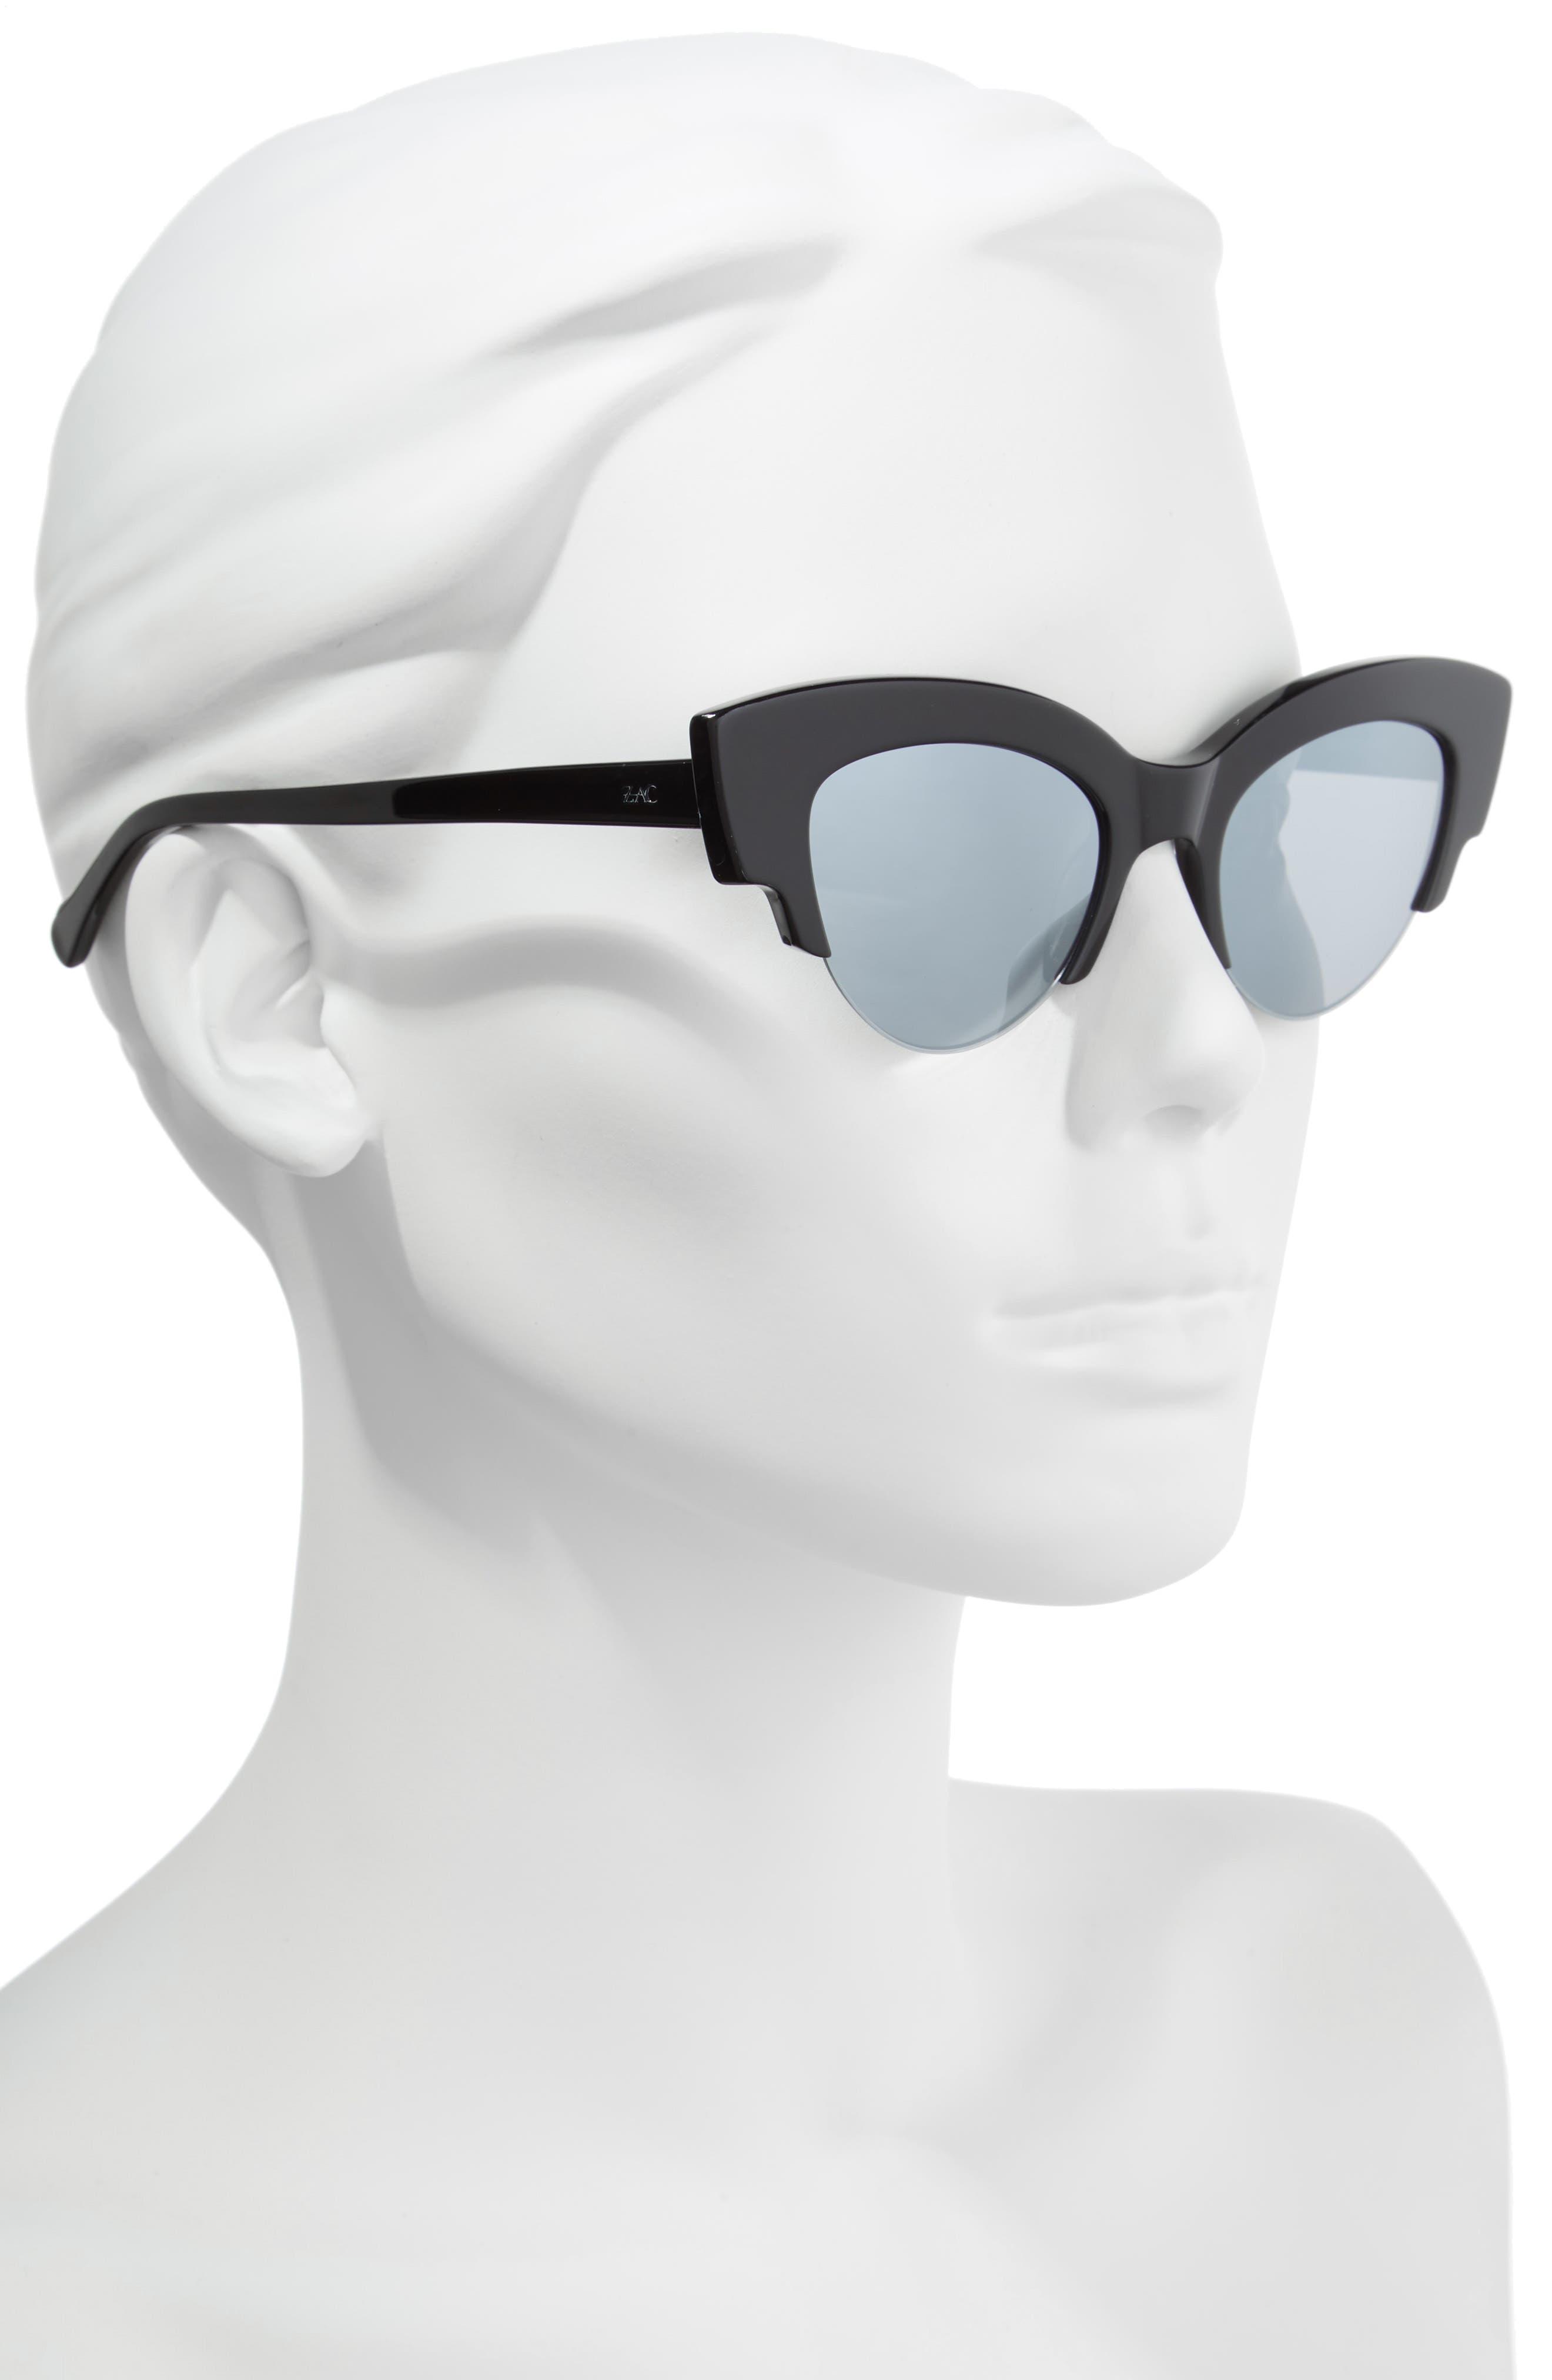 ZAC ZAC POSEN,                             Winona Cat Eye Sunglasses,                             Alternate thumbnail 2, color,                             BLACK/ SILVER